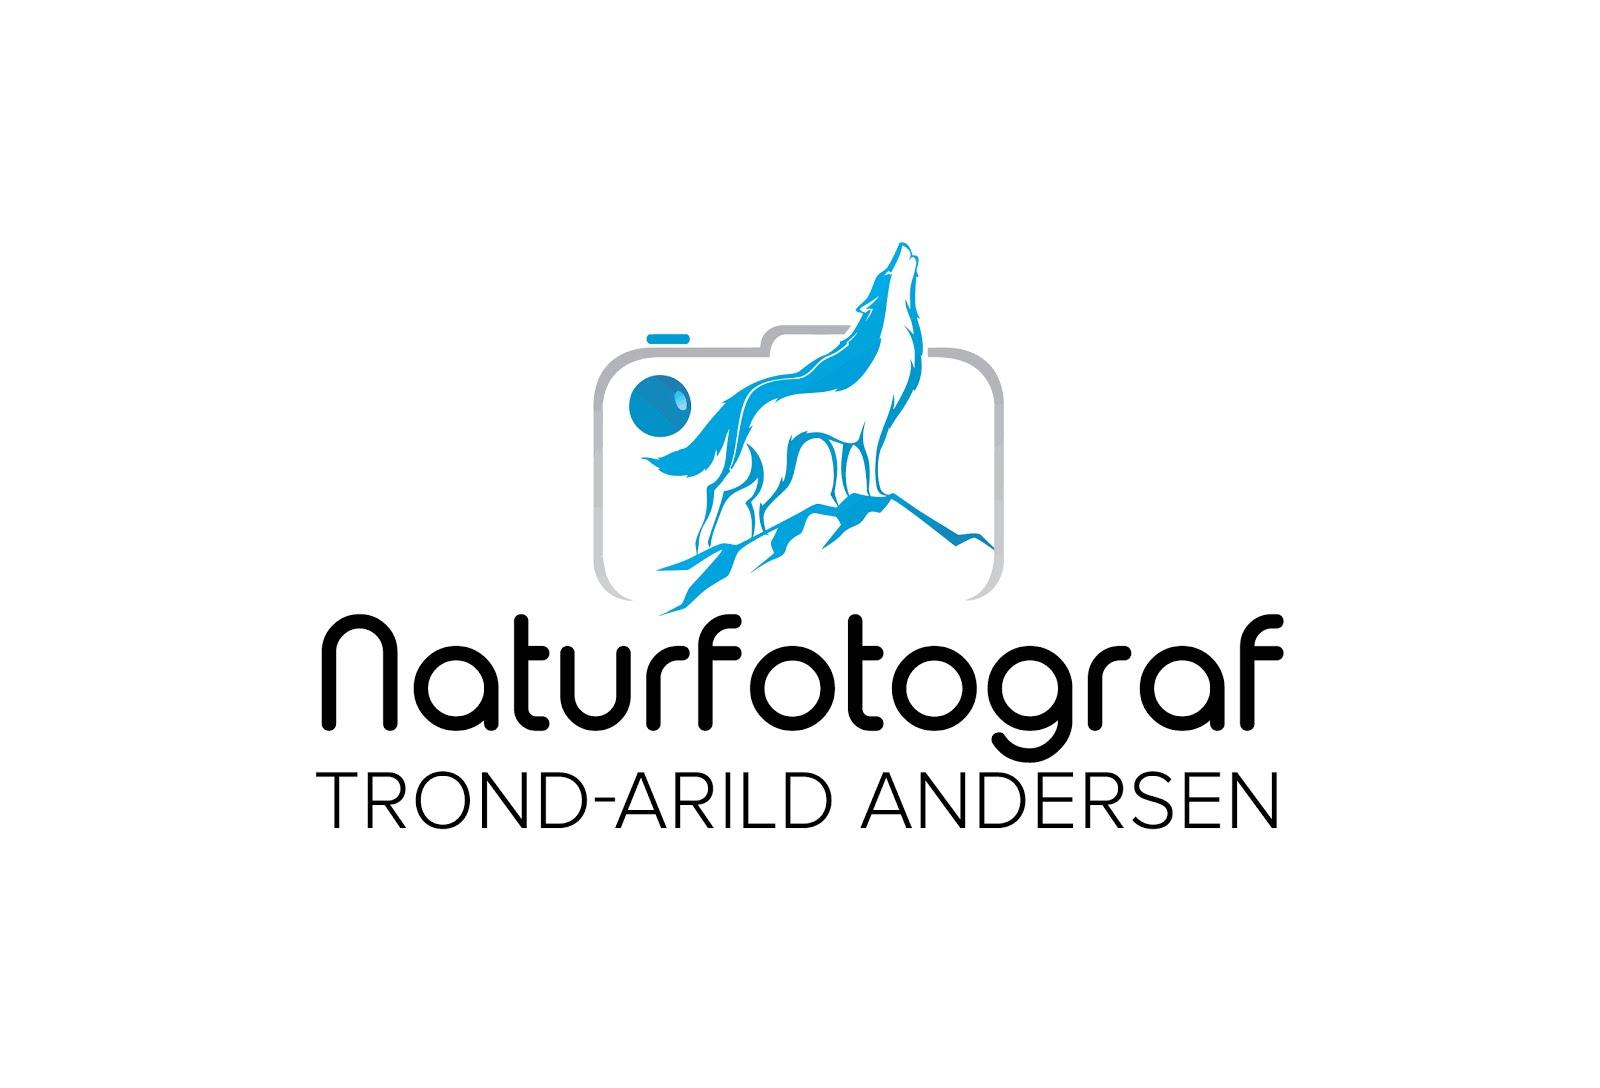 Naturfotograf Trond-Arild Andersen